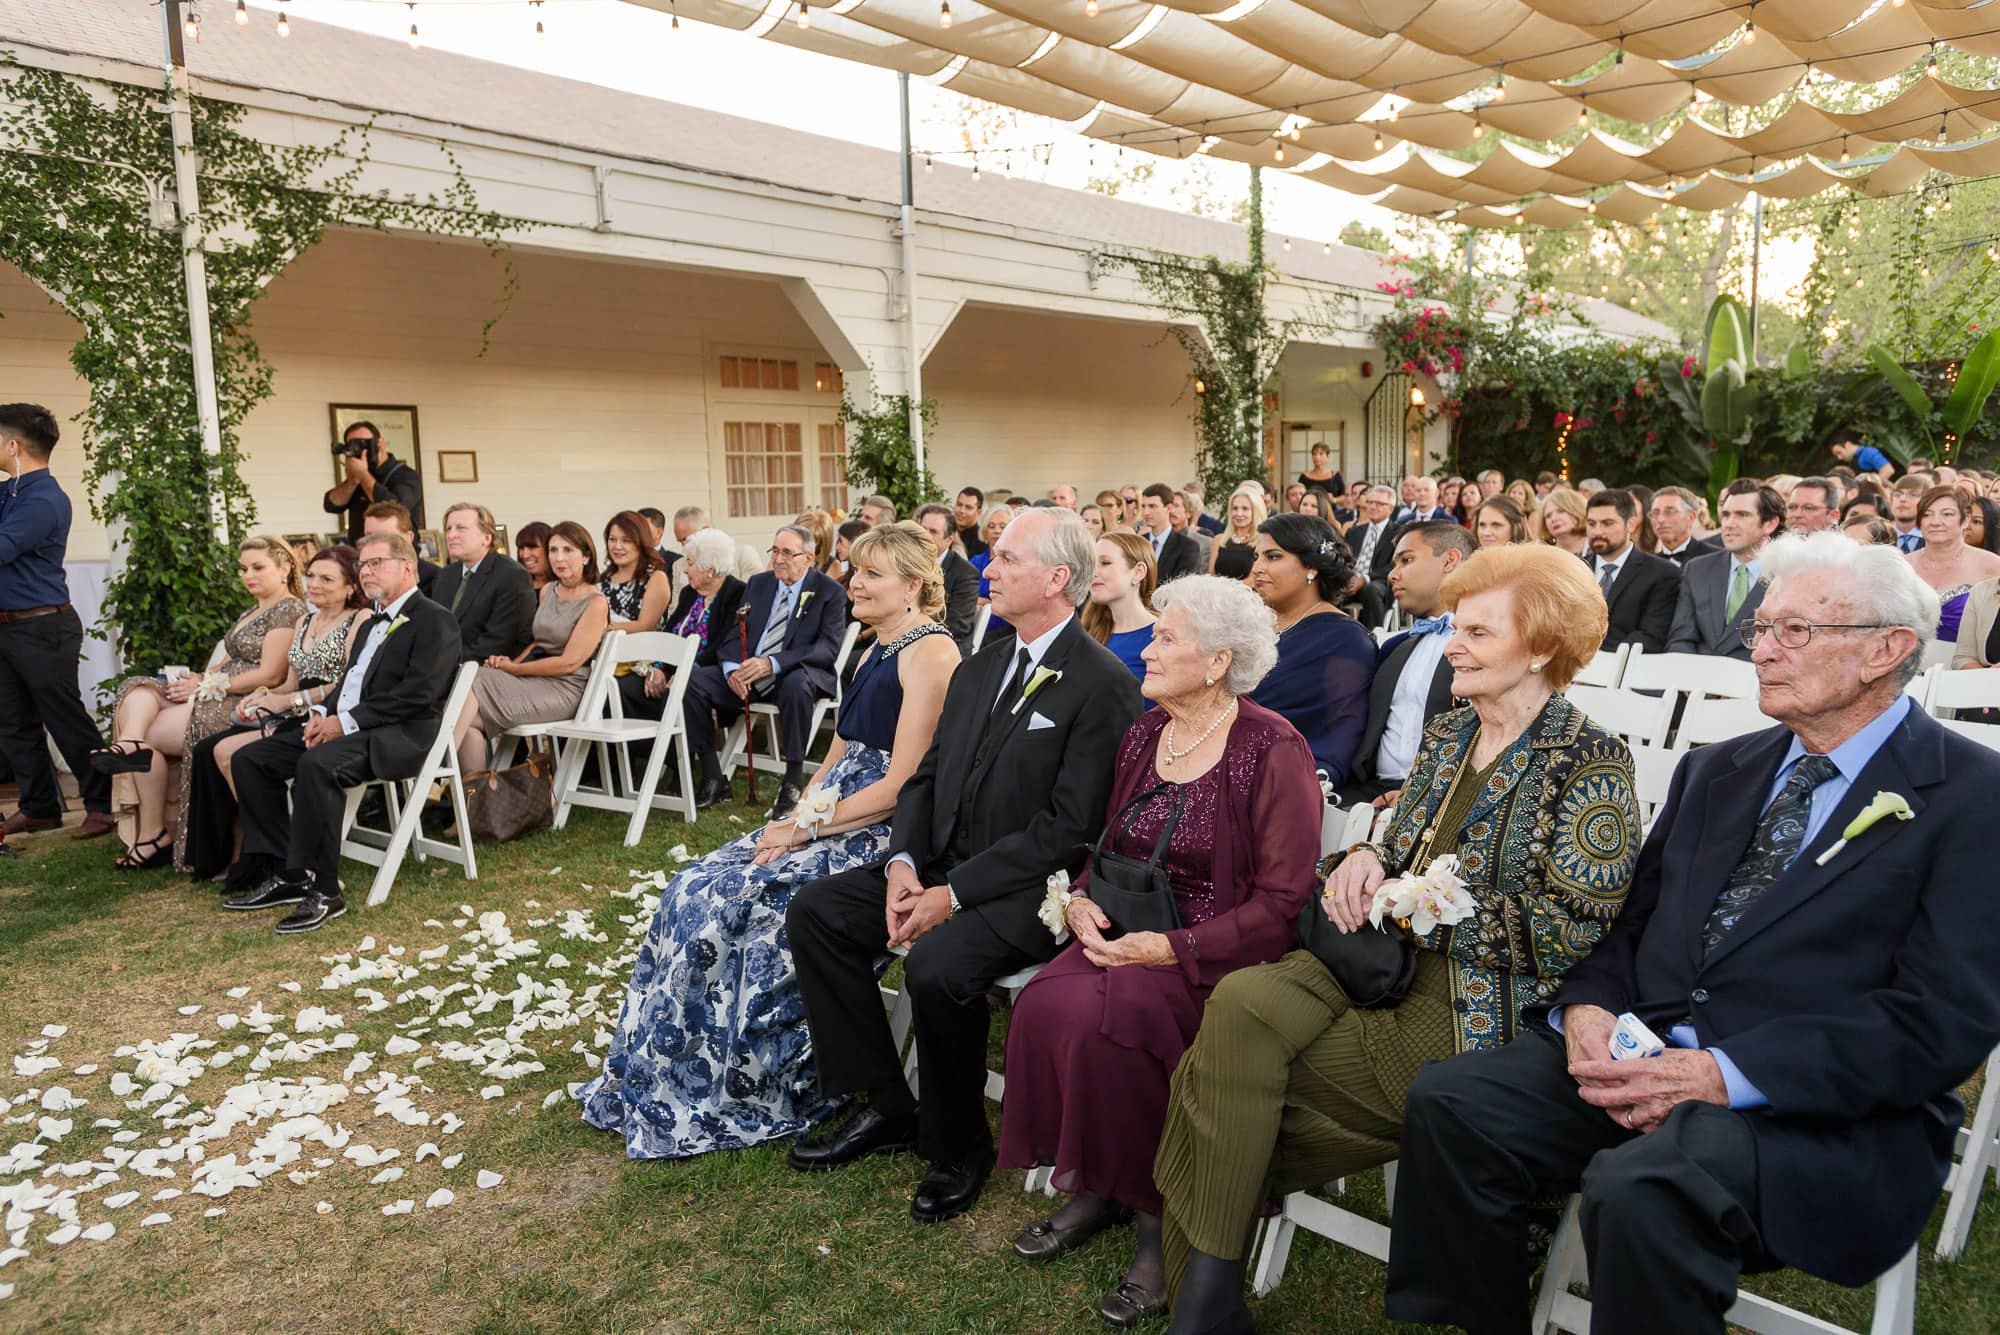 043_Alan_and_Heidi_Los_Angeles_Equestrian_Center_Wedding